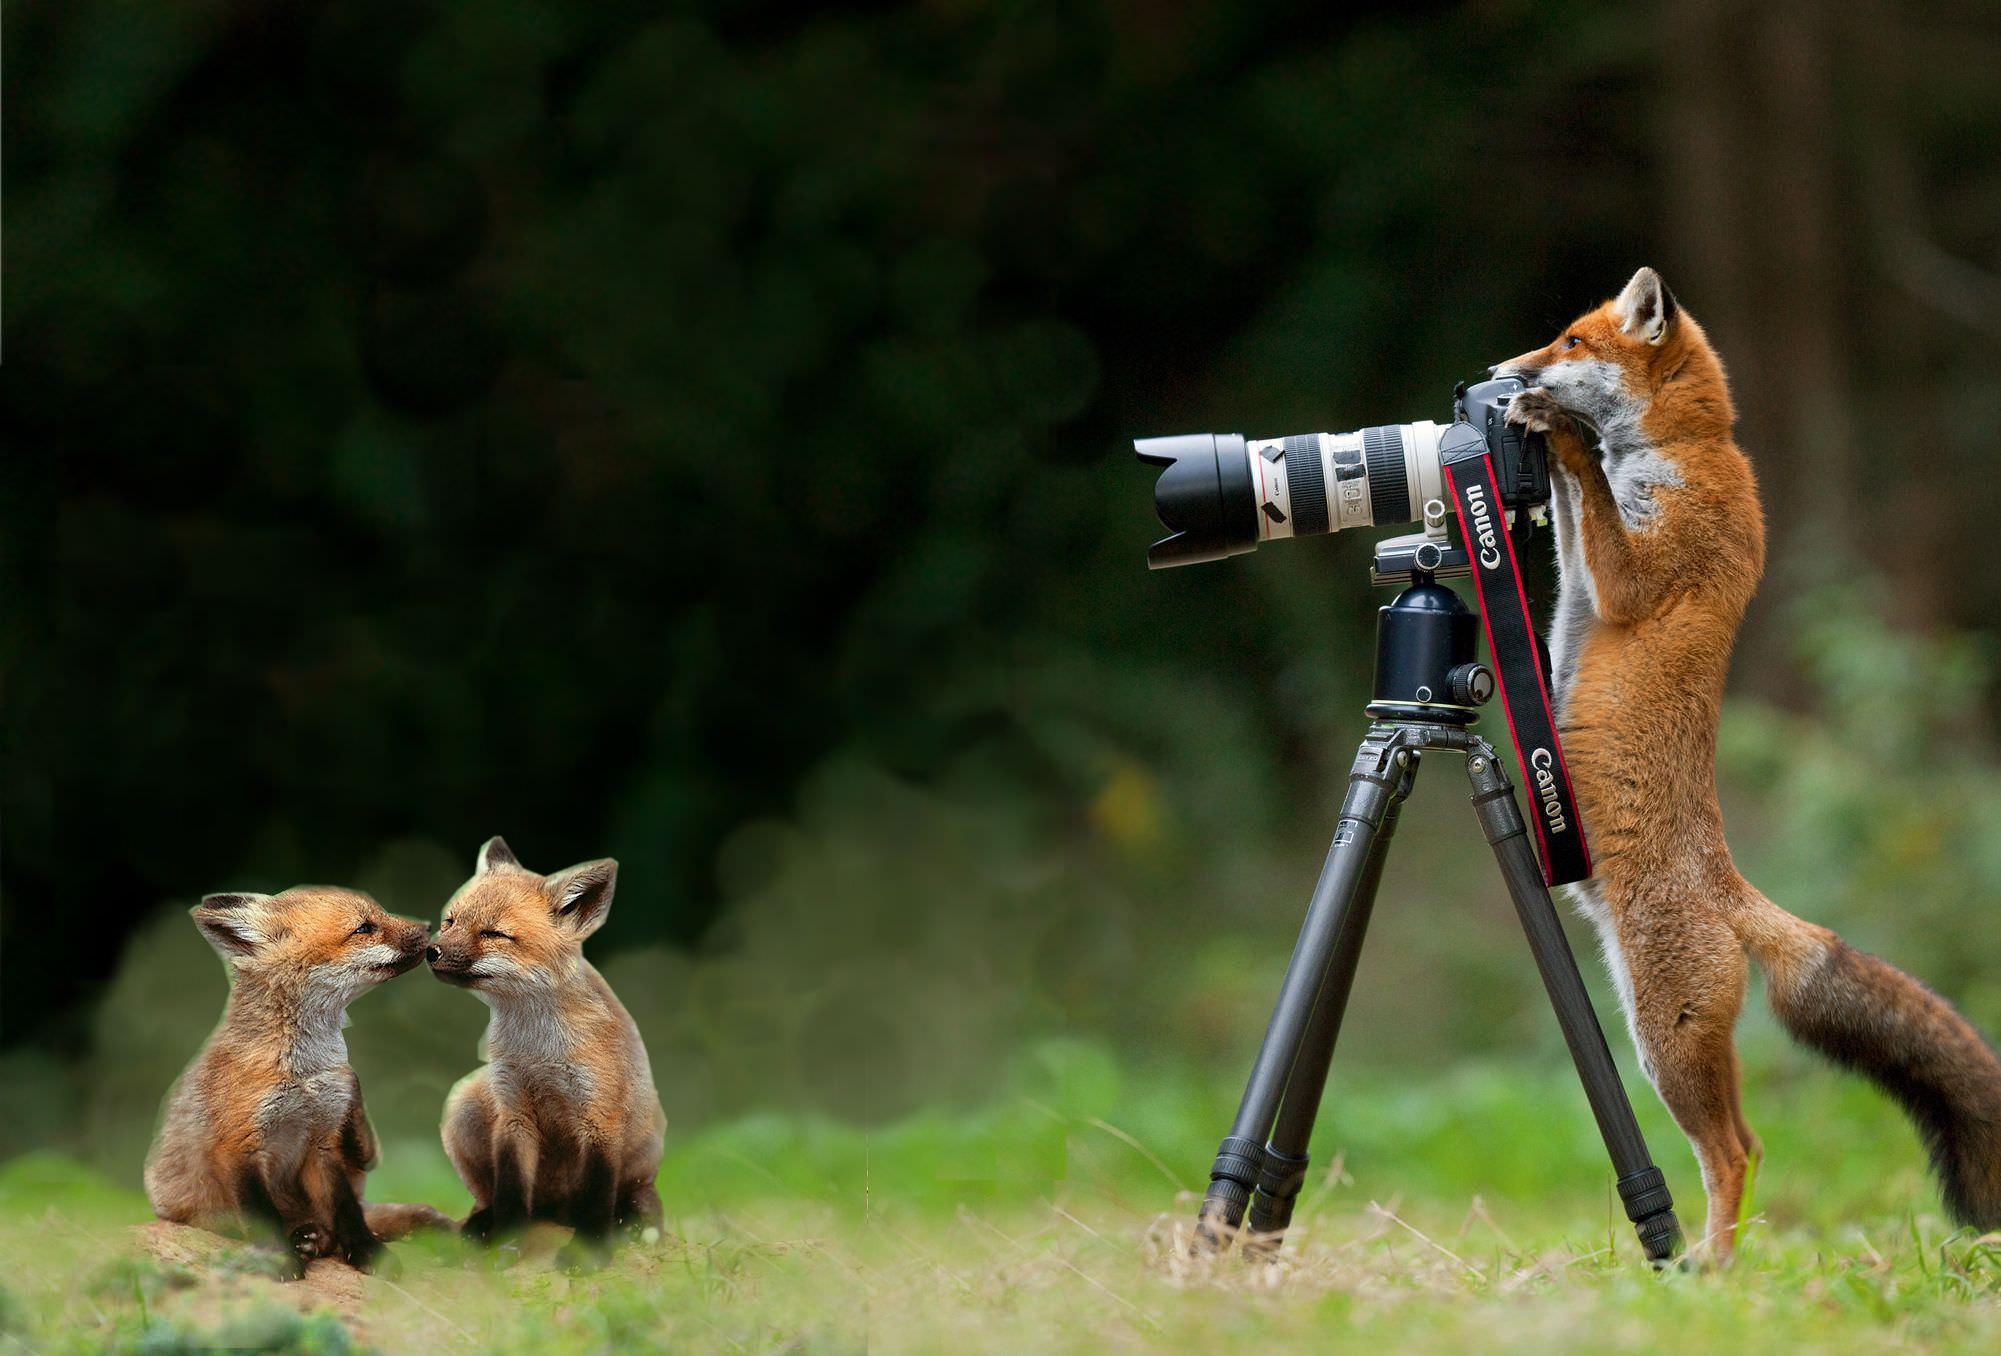 fotografia naturalistica